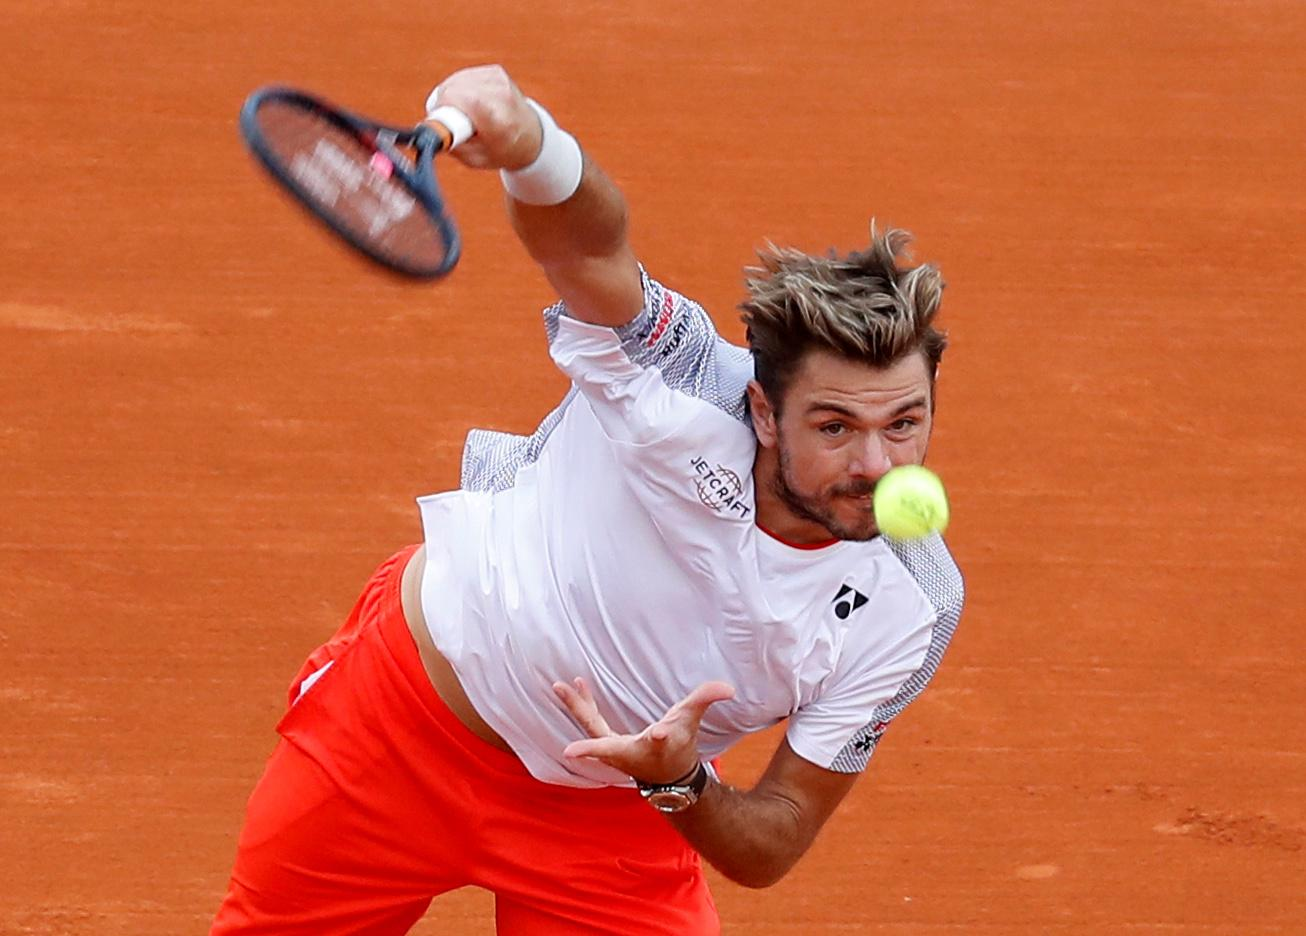 Tennis: Love of tennis key to Wawrinka's comeback